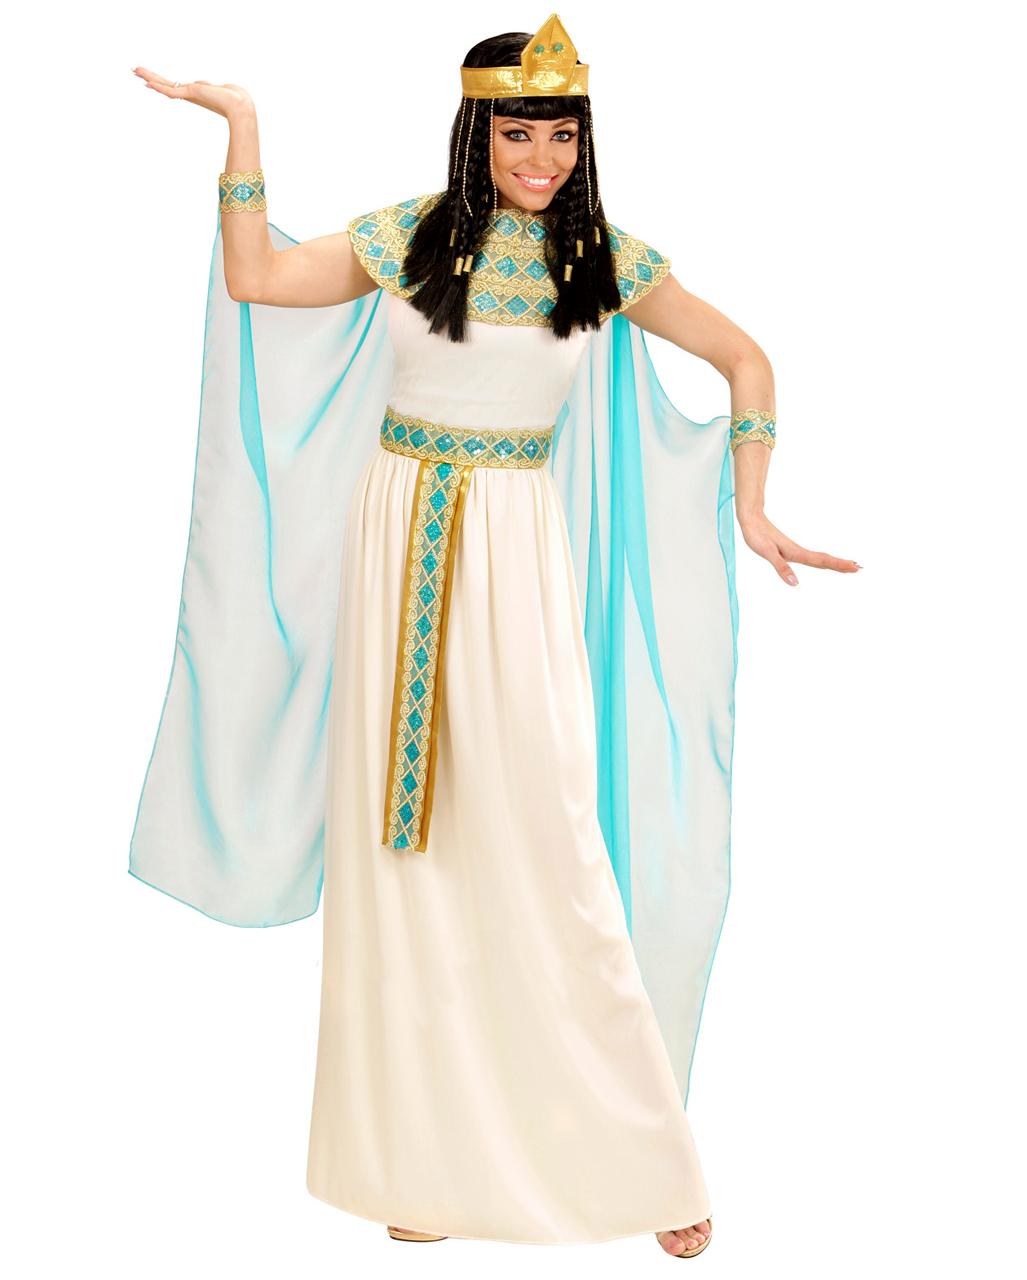 4 Tlg Cleopatra Kostum Deluxe Fur Karneval Horror Shop Com